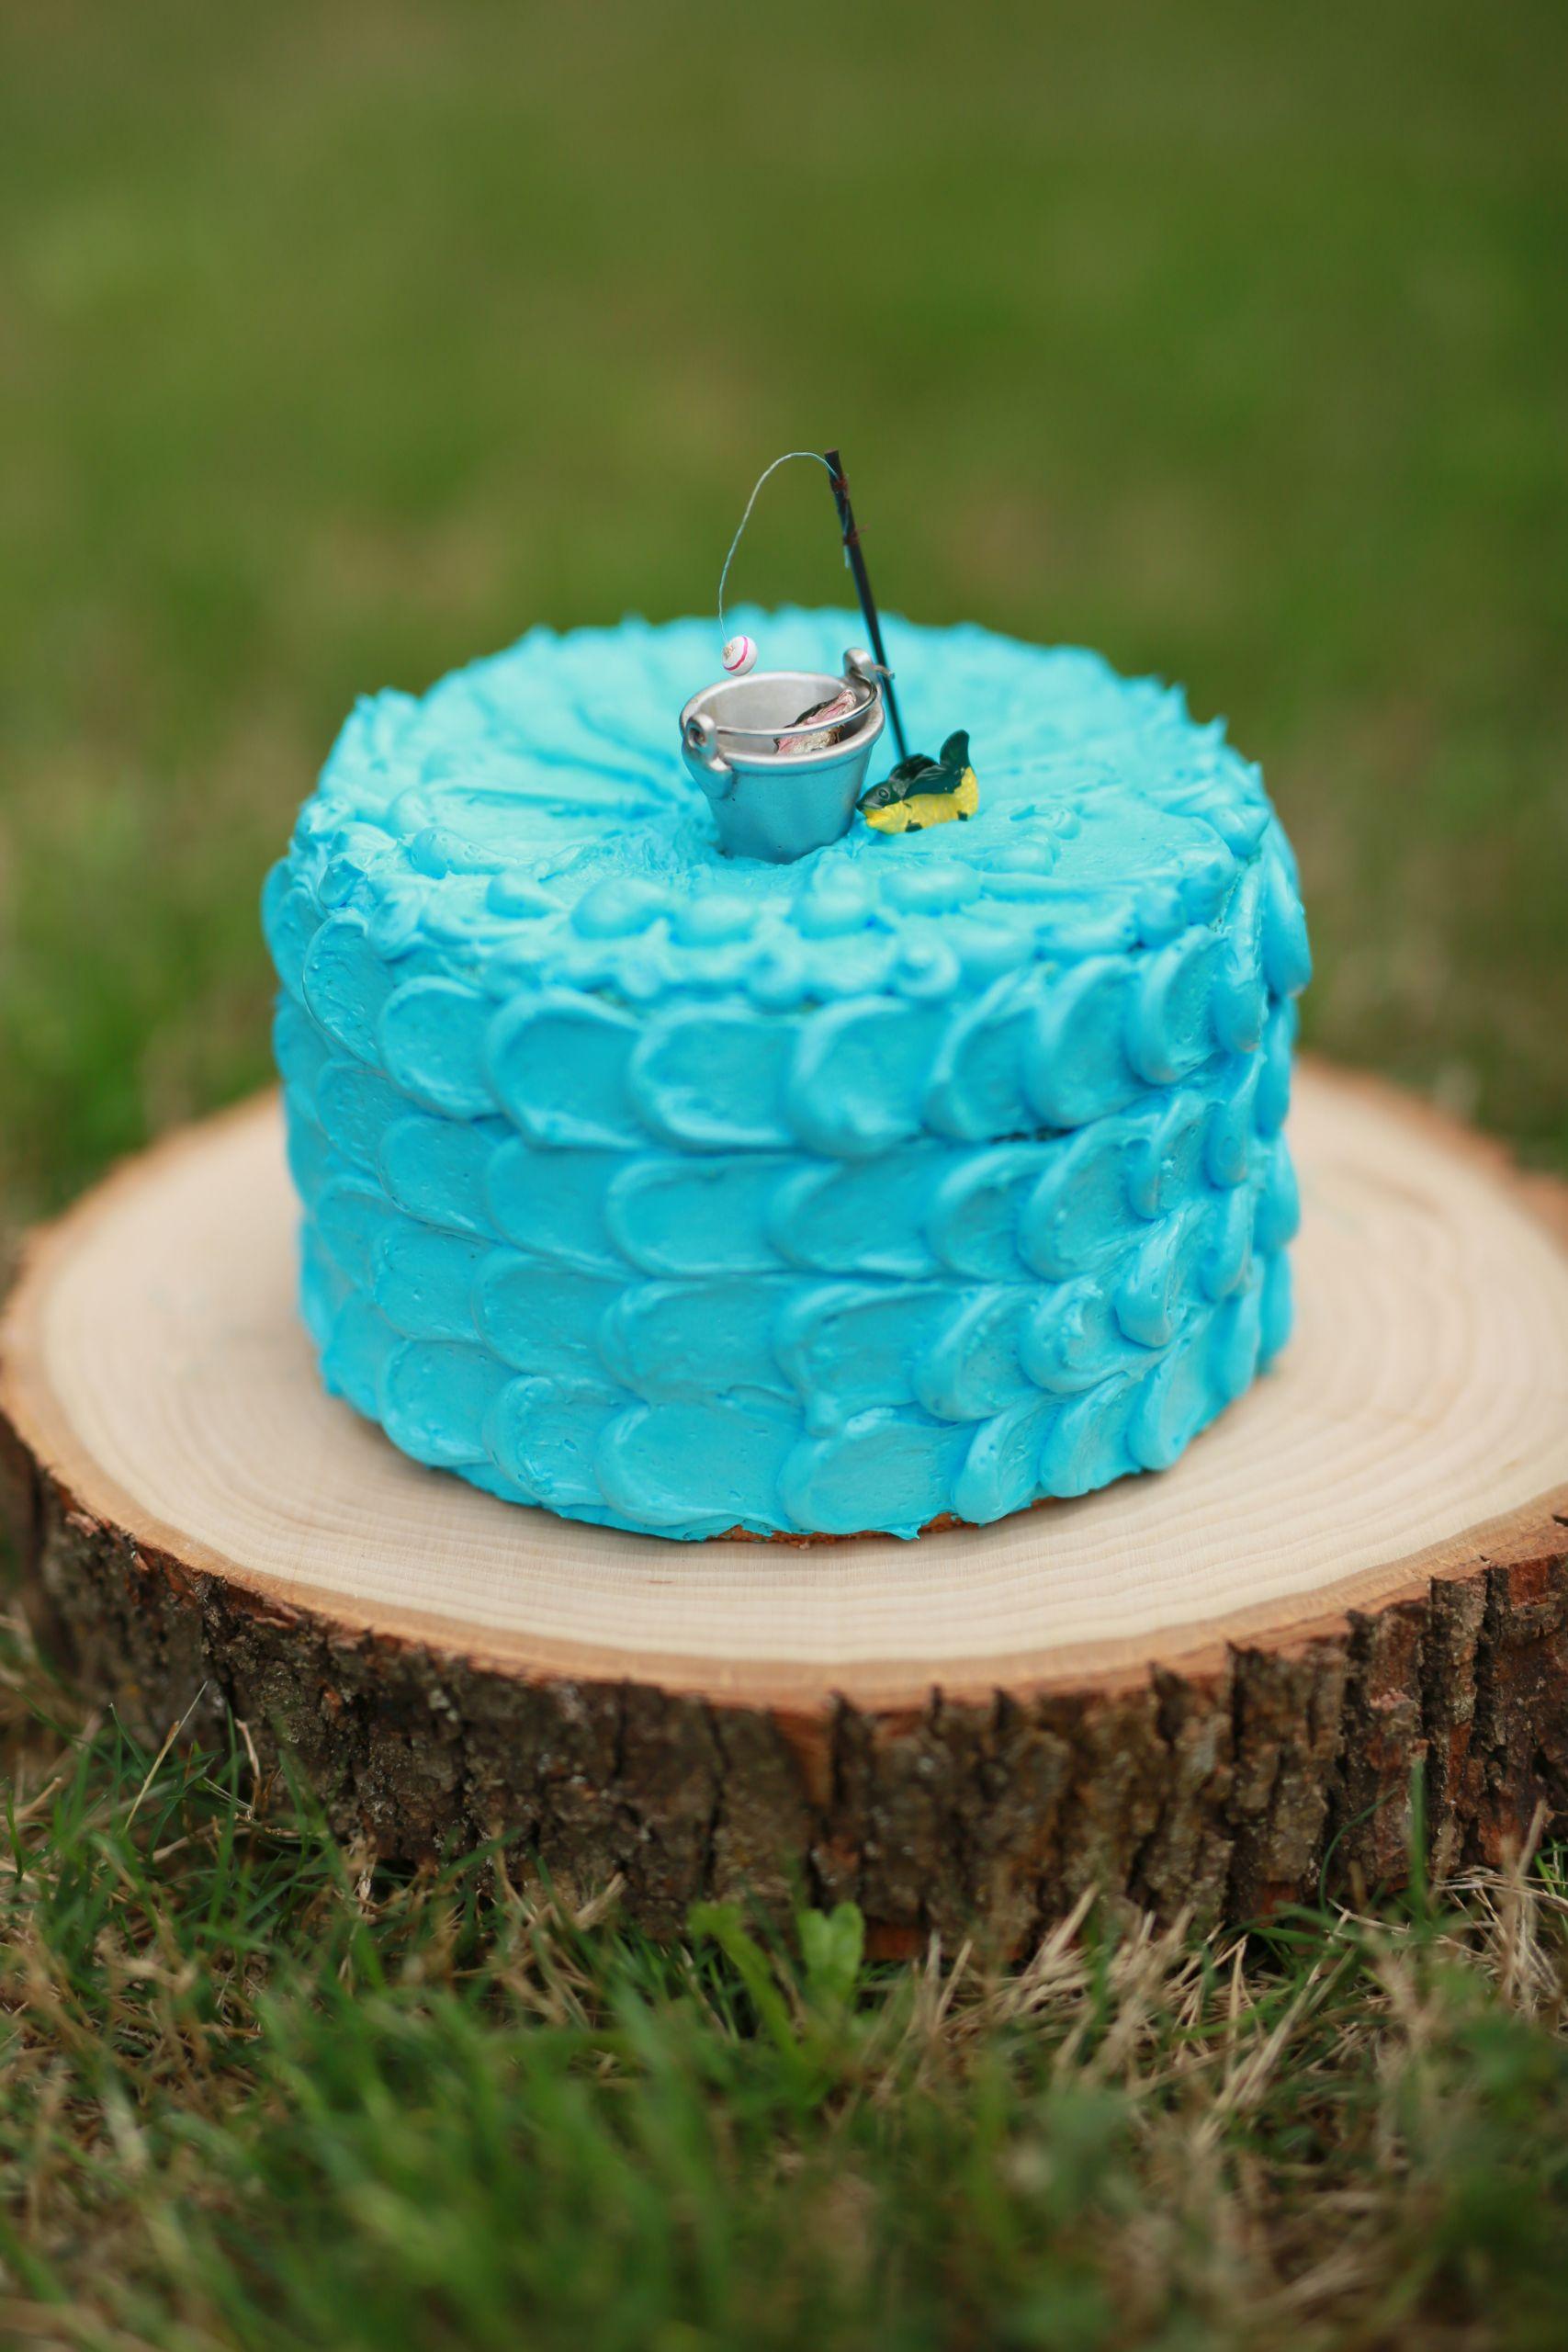 Fishing Birthday Cakes  Smash Cake Session Newnan Ga Child grapher